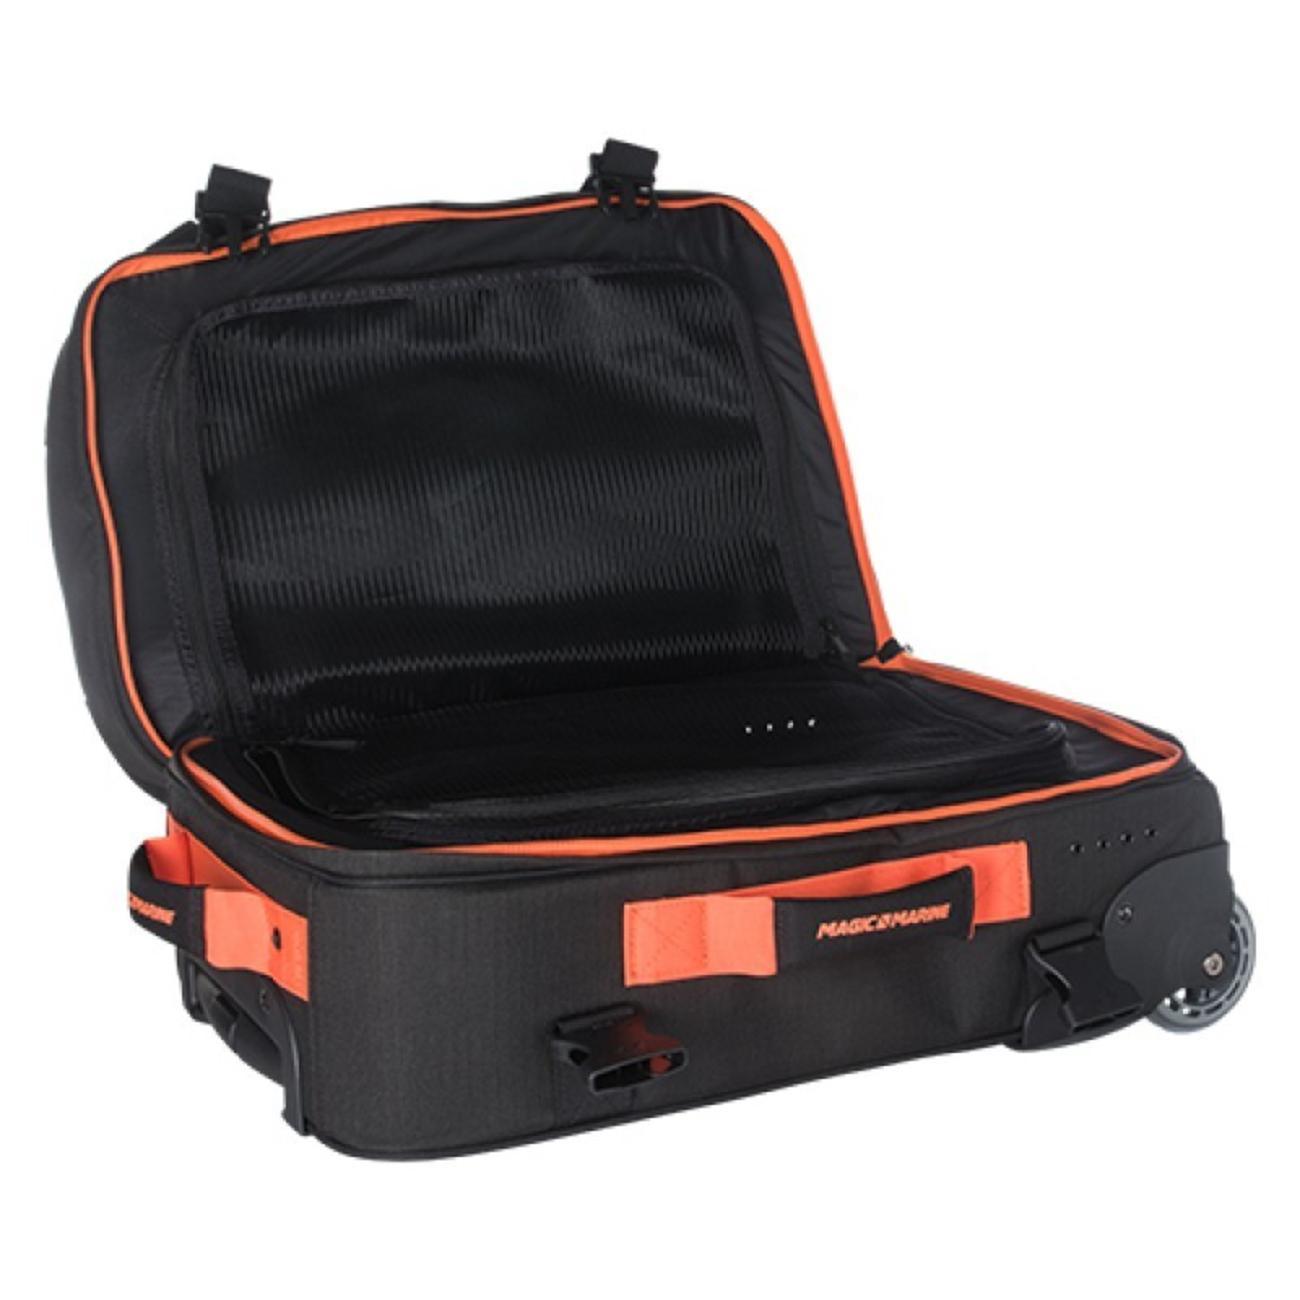 Flight Bag 30L 小型キャリーバッグ 機内持ち込みサイズ